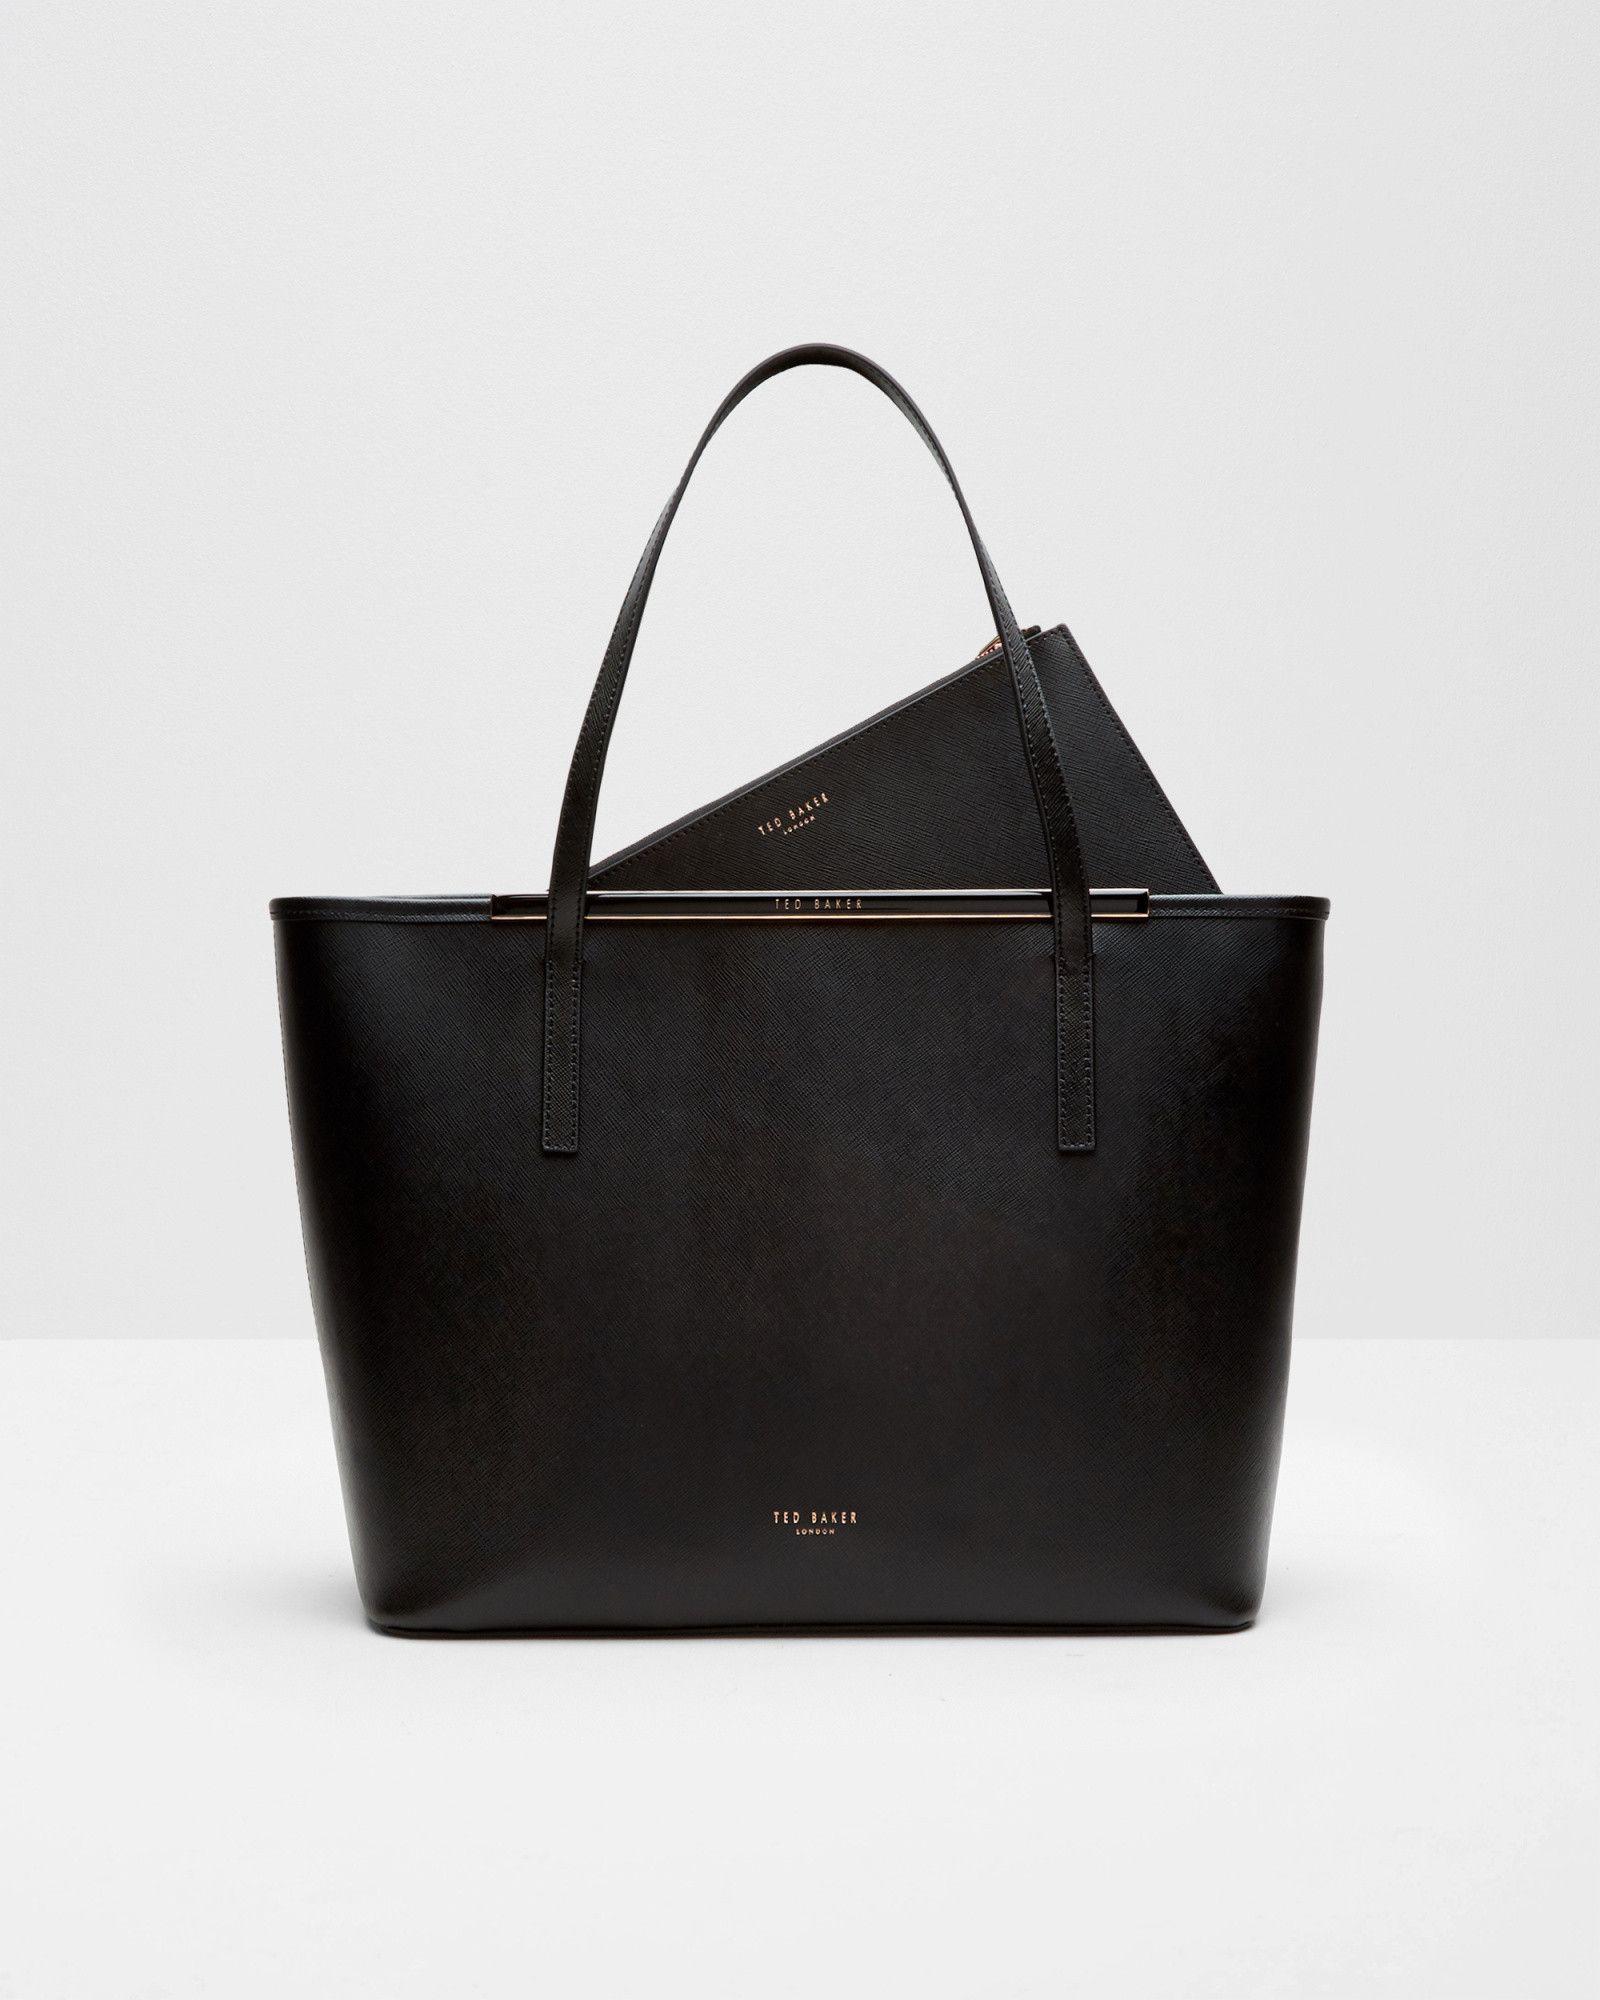 665e85a7f4fc2 Ted Baker Enamel bar crosshatch leather shopper bag Black